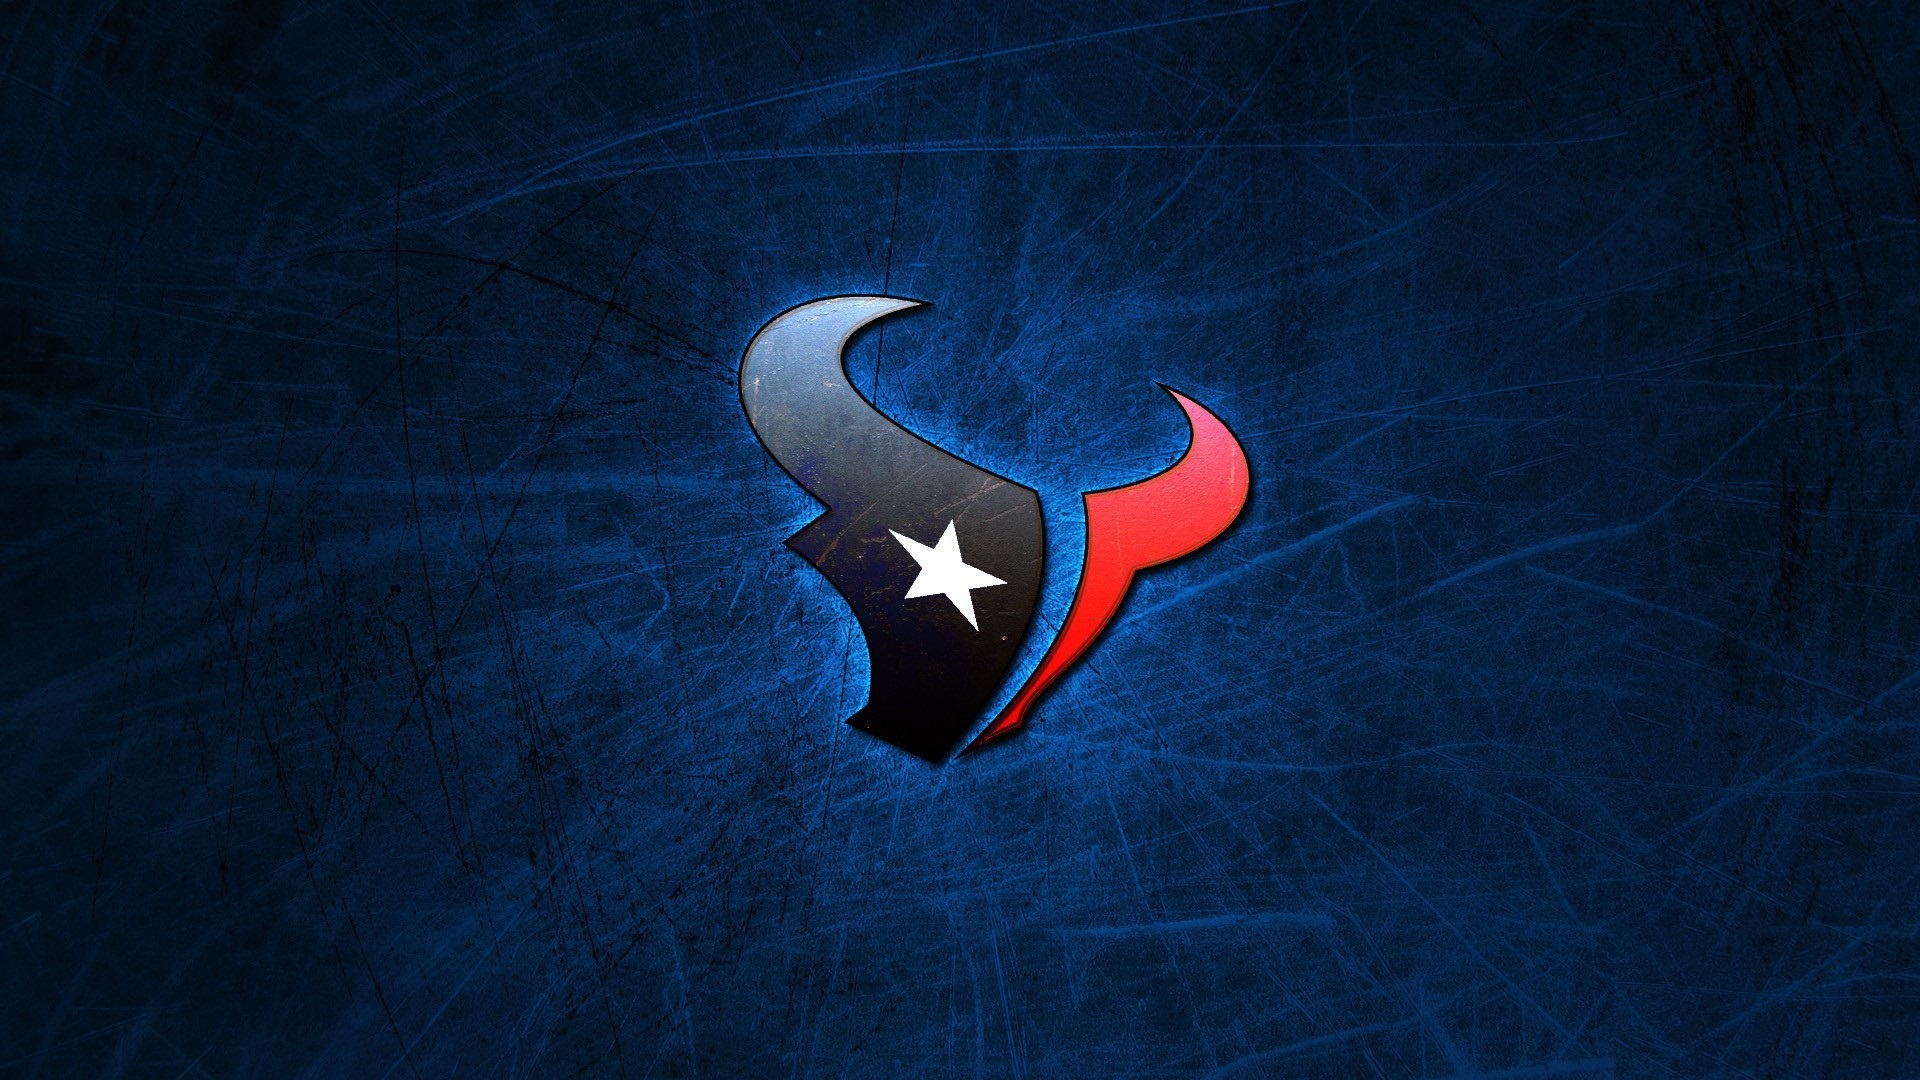 Houston Texans Wallpaper 2019 NFL Football Wallpapers 1920x1080